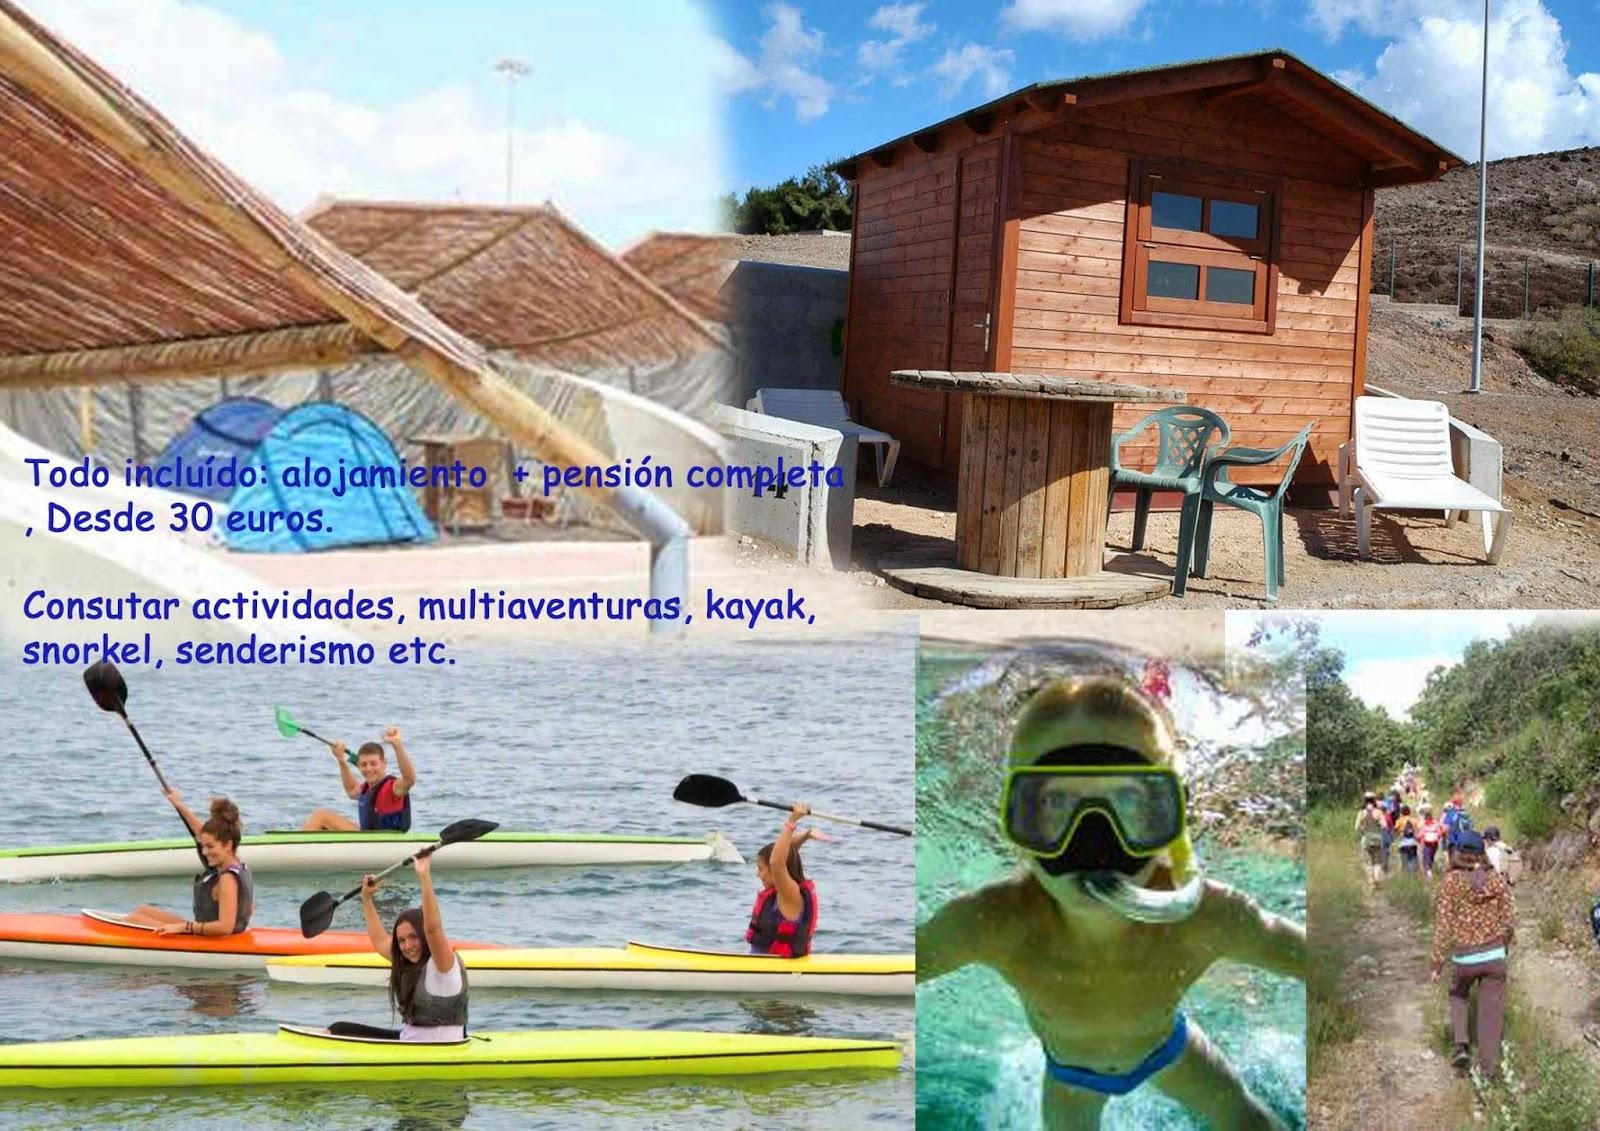 http://campingplayadevargas.blogspot.com.es/2014/03/actividades-para-colegios-grupos.html